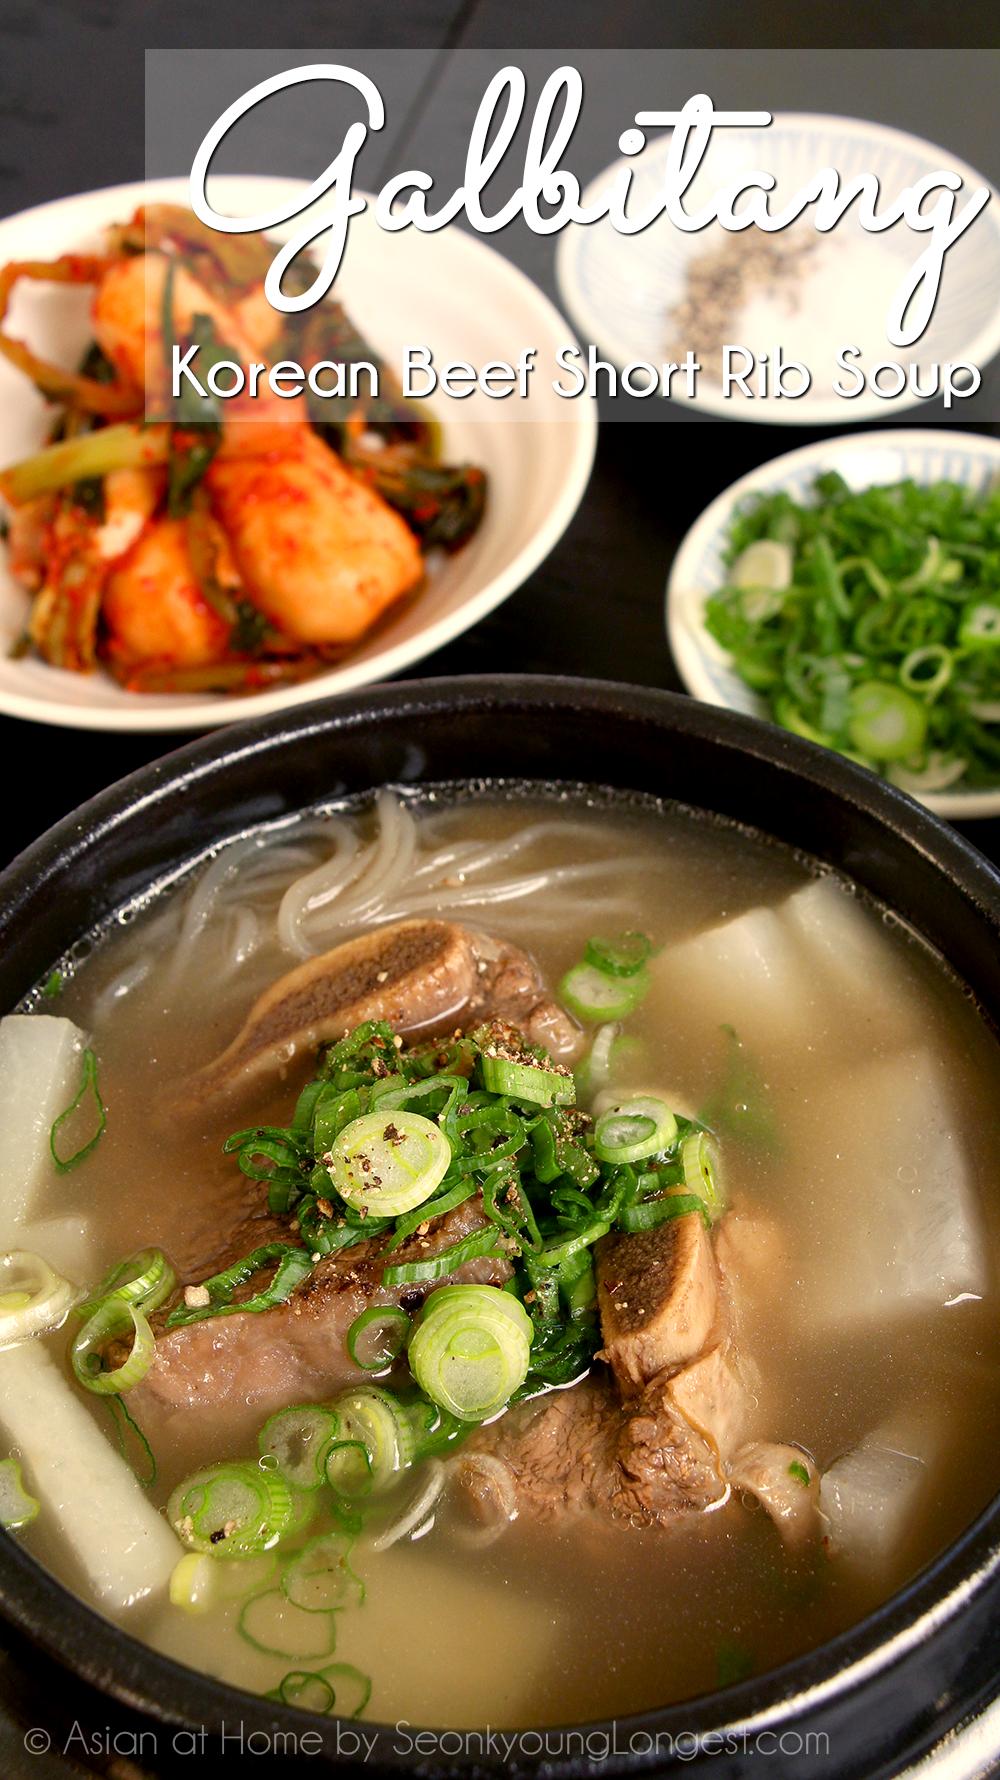 Galbitang (Korean Beef Short Rib Soup) | Receta | Recetas coreanas ...